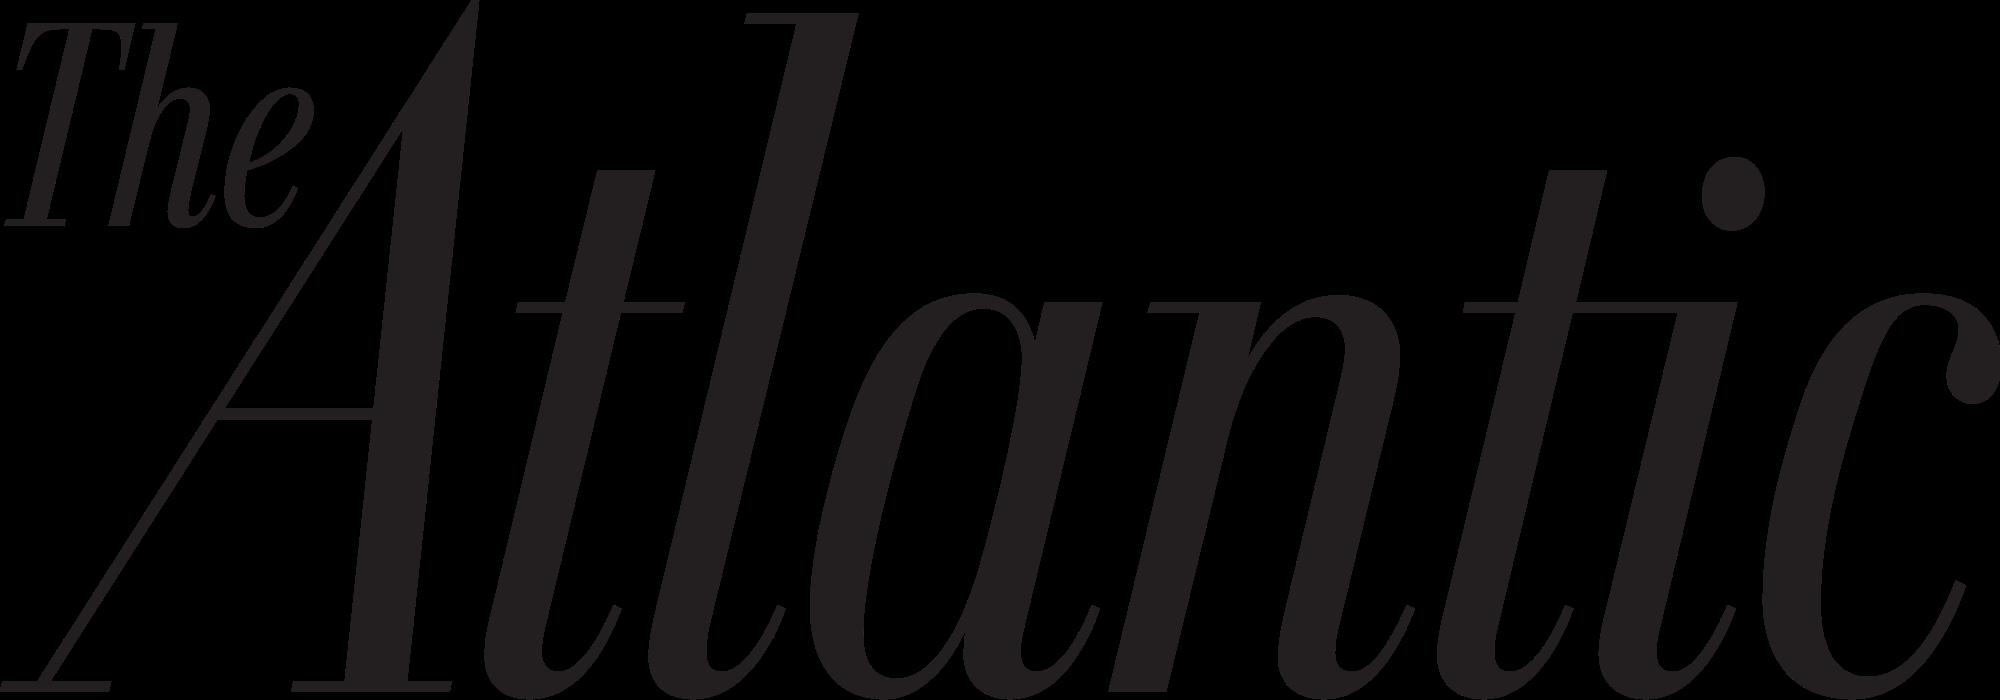 The_Atlantic_magazine_logo.png